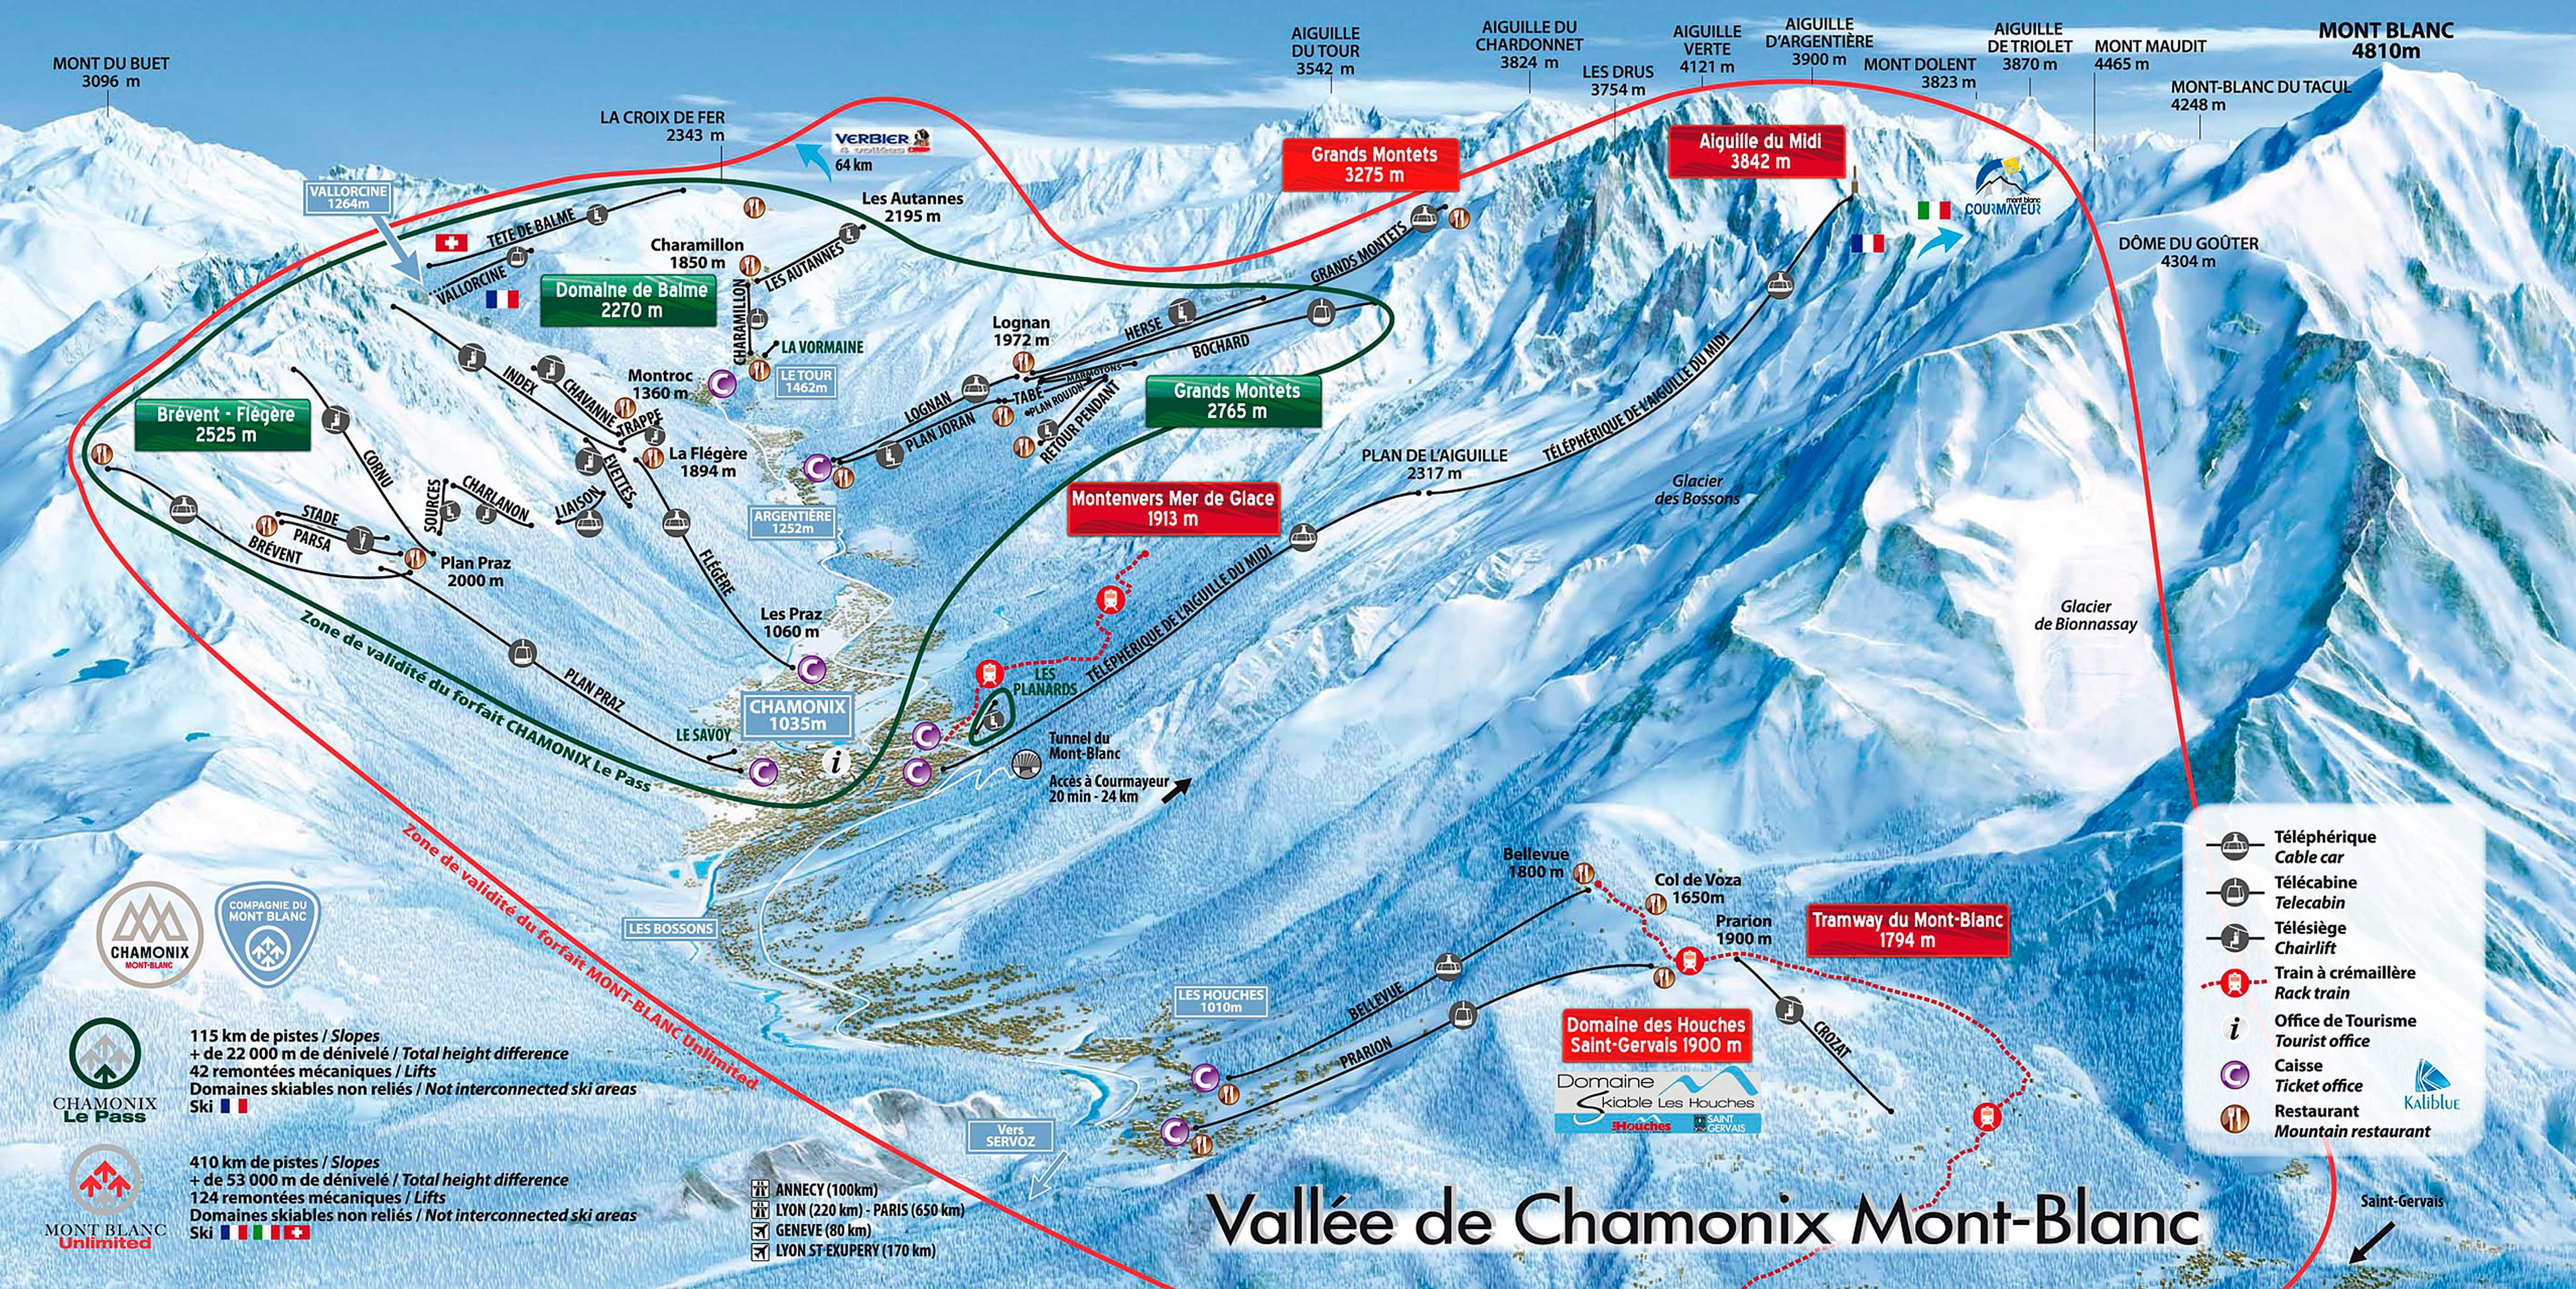 mapa pistas Chamonix Montblanc Unlimited